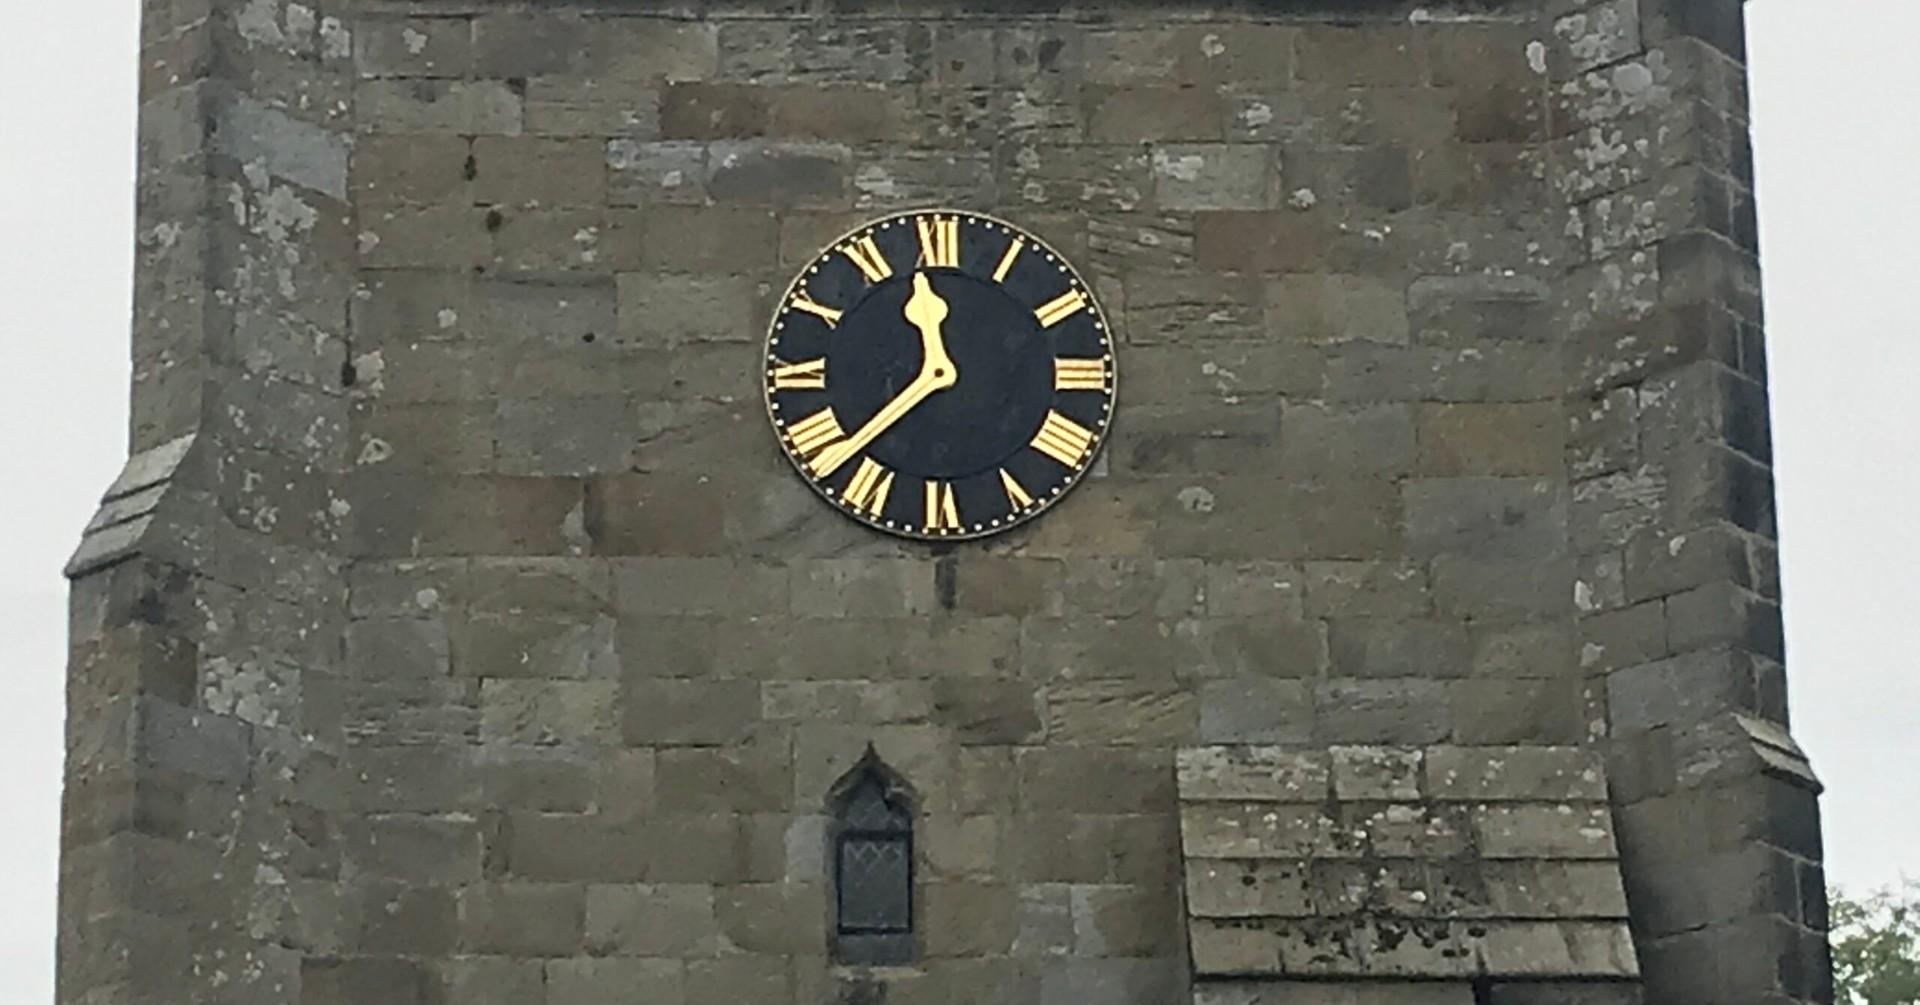 Time stands still in Kirkby Malzeard